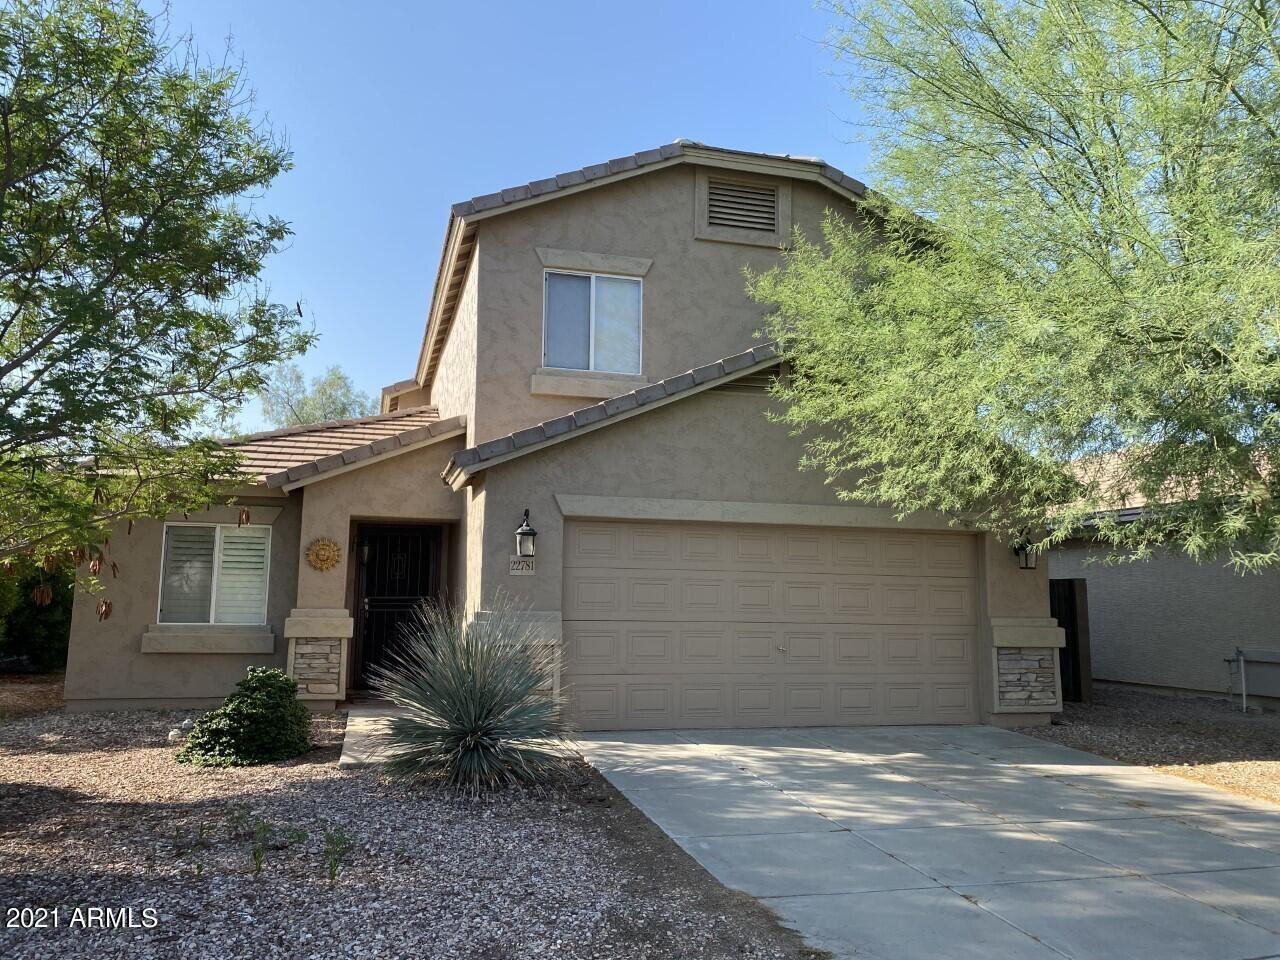 Photo of 22781 W MOHAVE Street, Buckeye, AZ 85326 (MLS # 6293861)